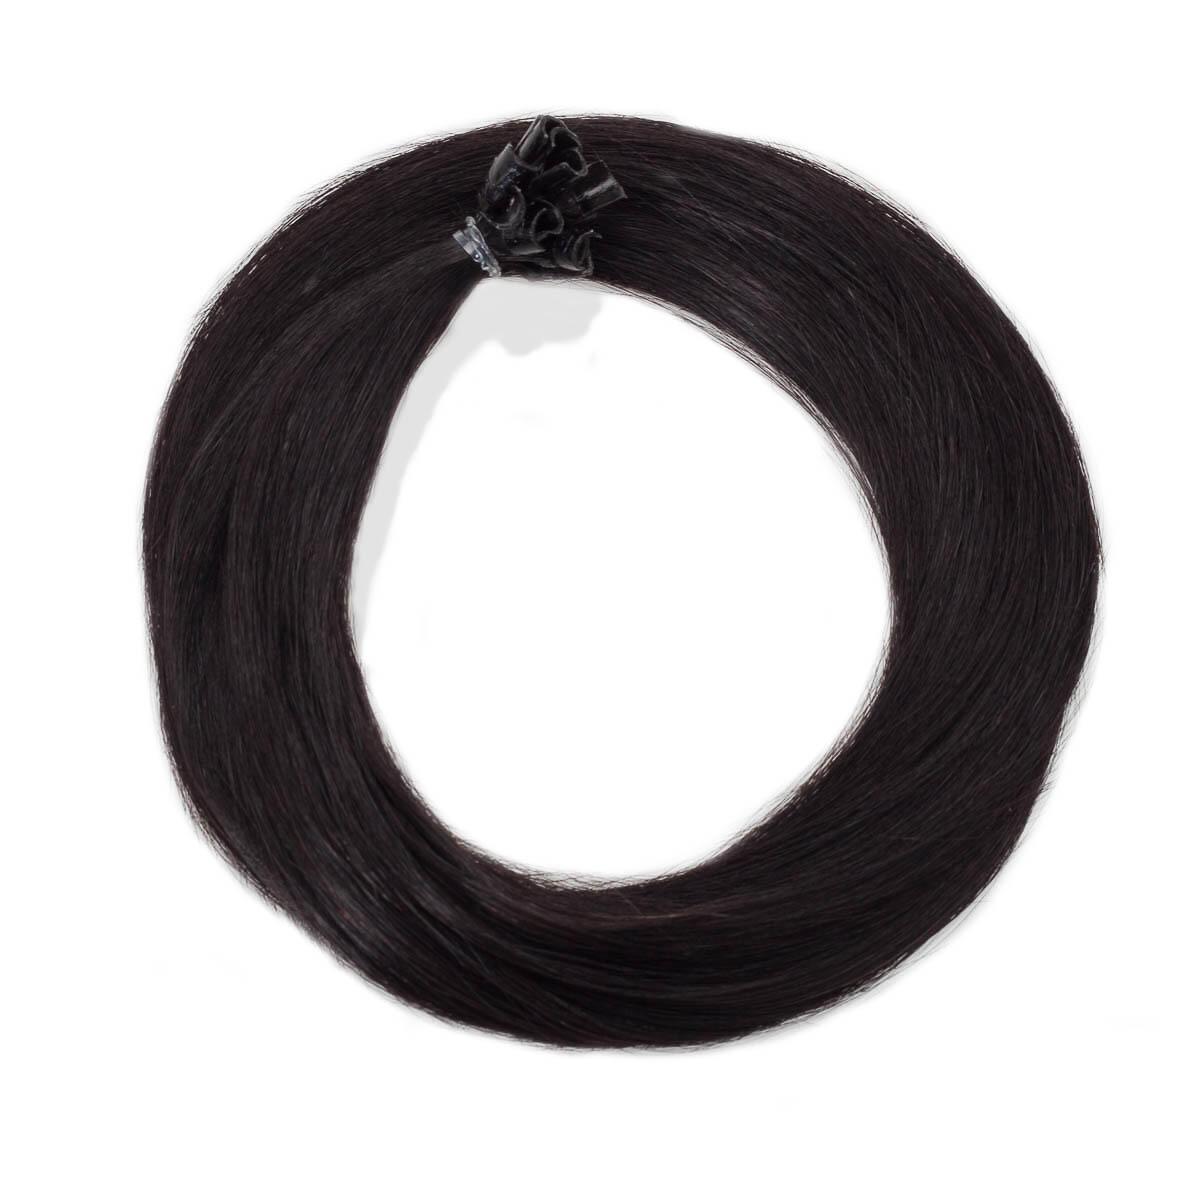 Nail Hair Original 1.2 Black Brown 60 cm